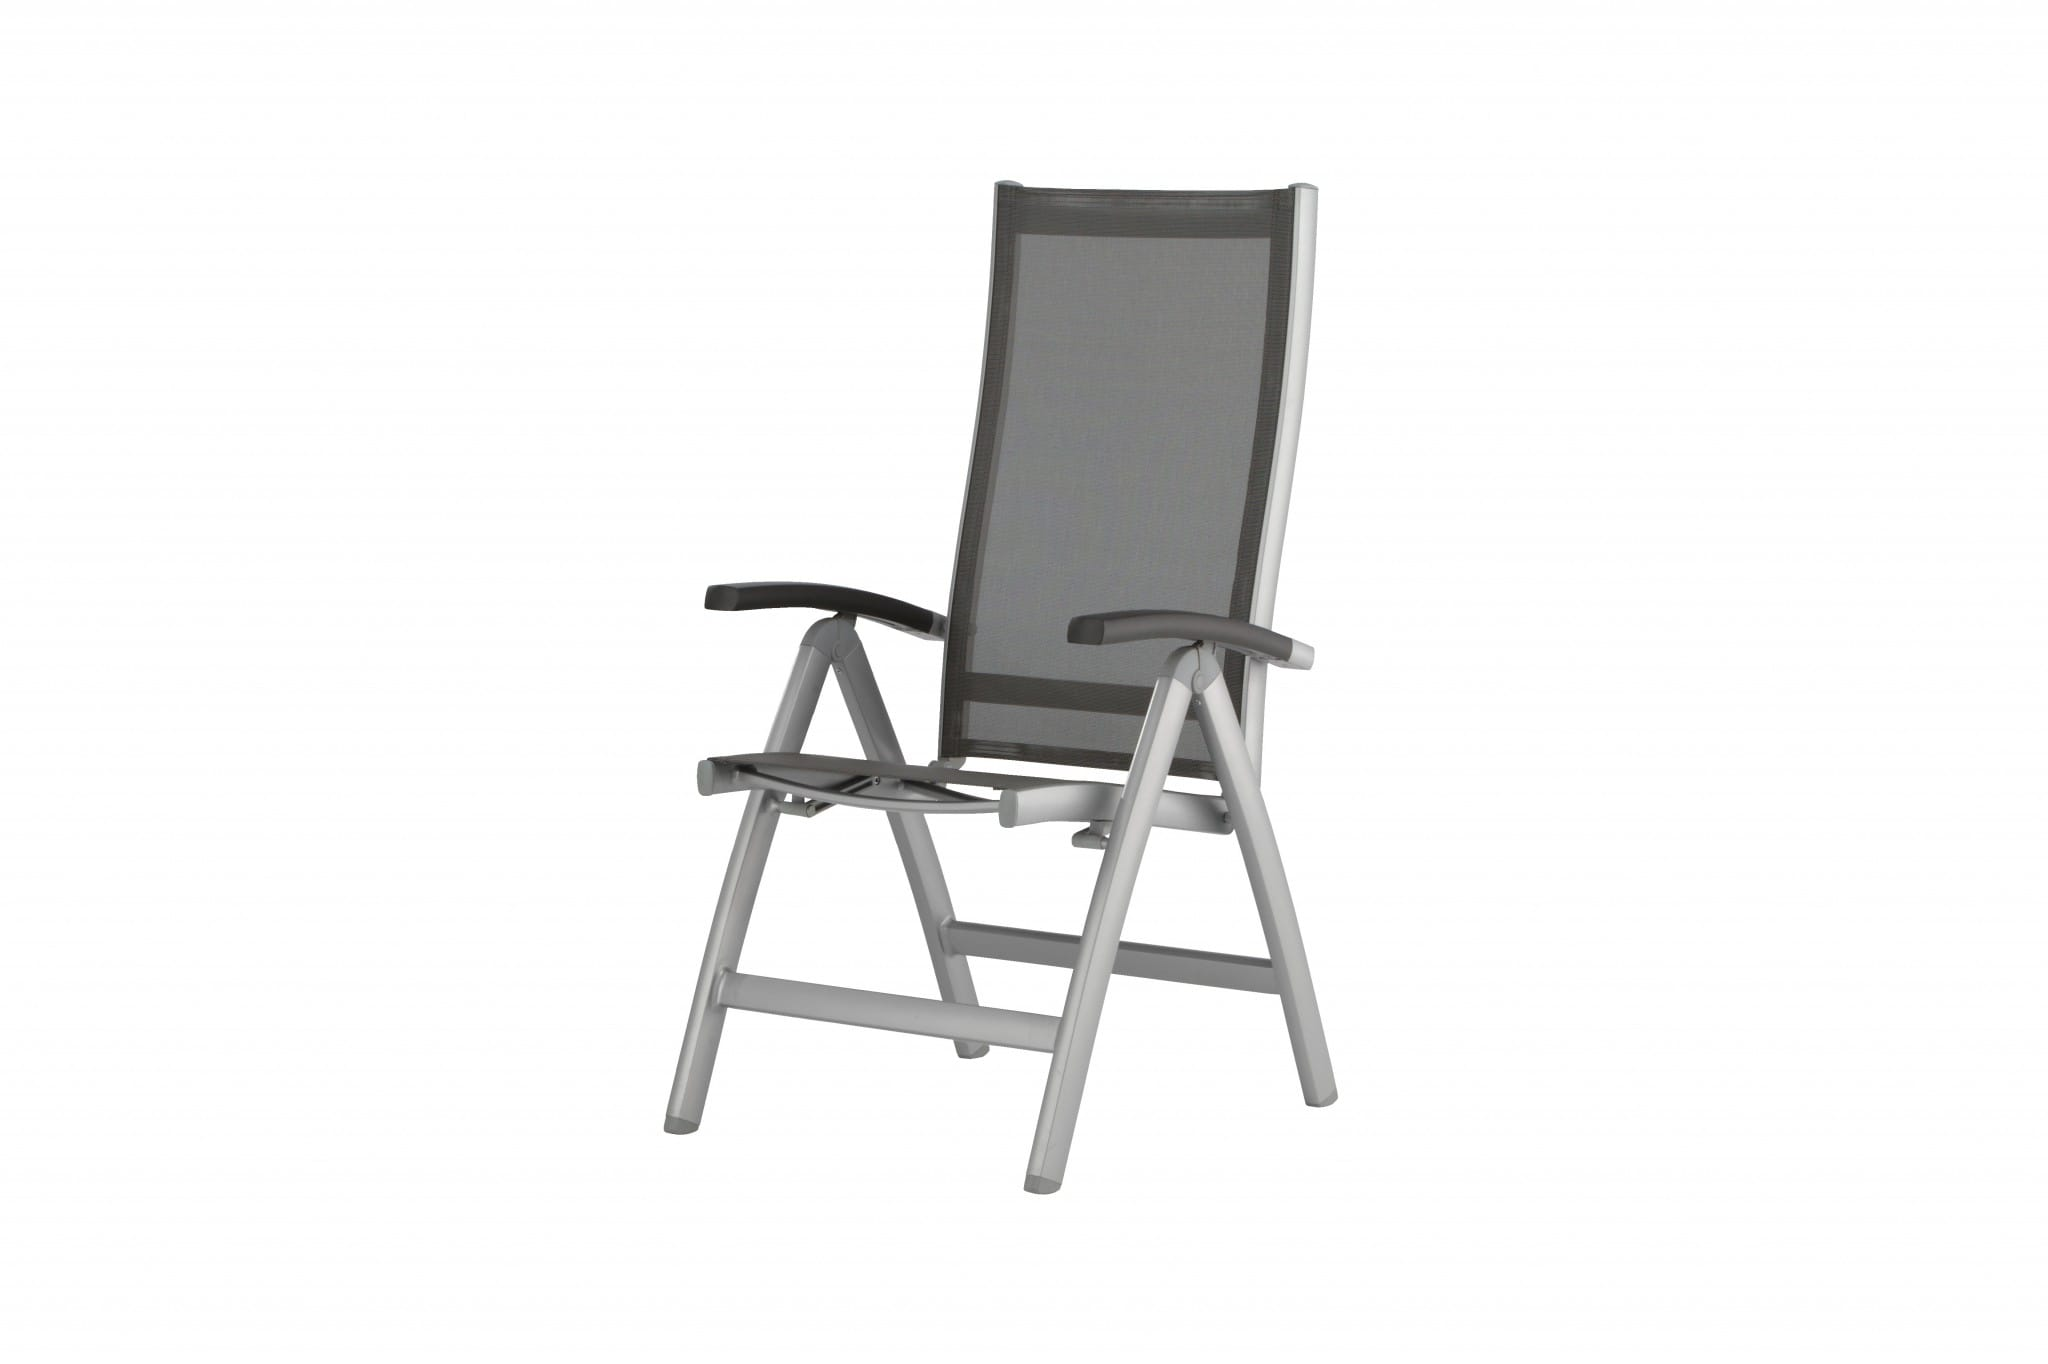 carma aluminium multipositionssessel kreta silber batyline bumb gartenm bel karlsruhe. Black Bedroom Furniture Sets. Home Design Ideas